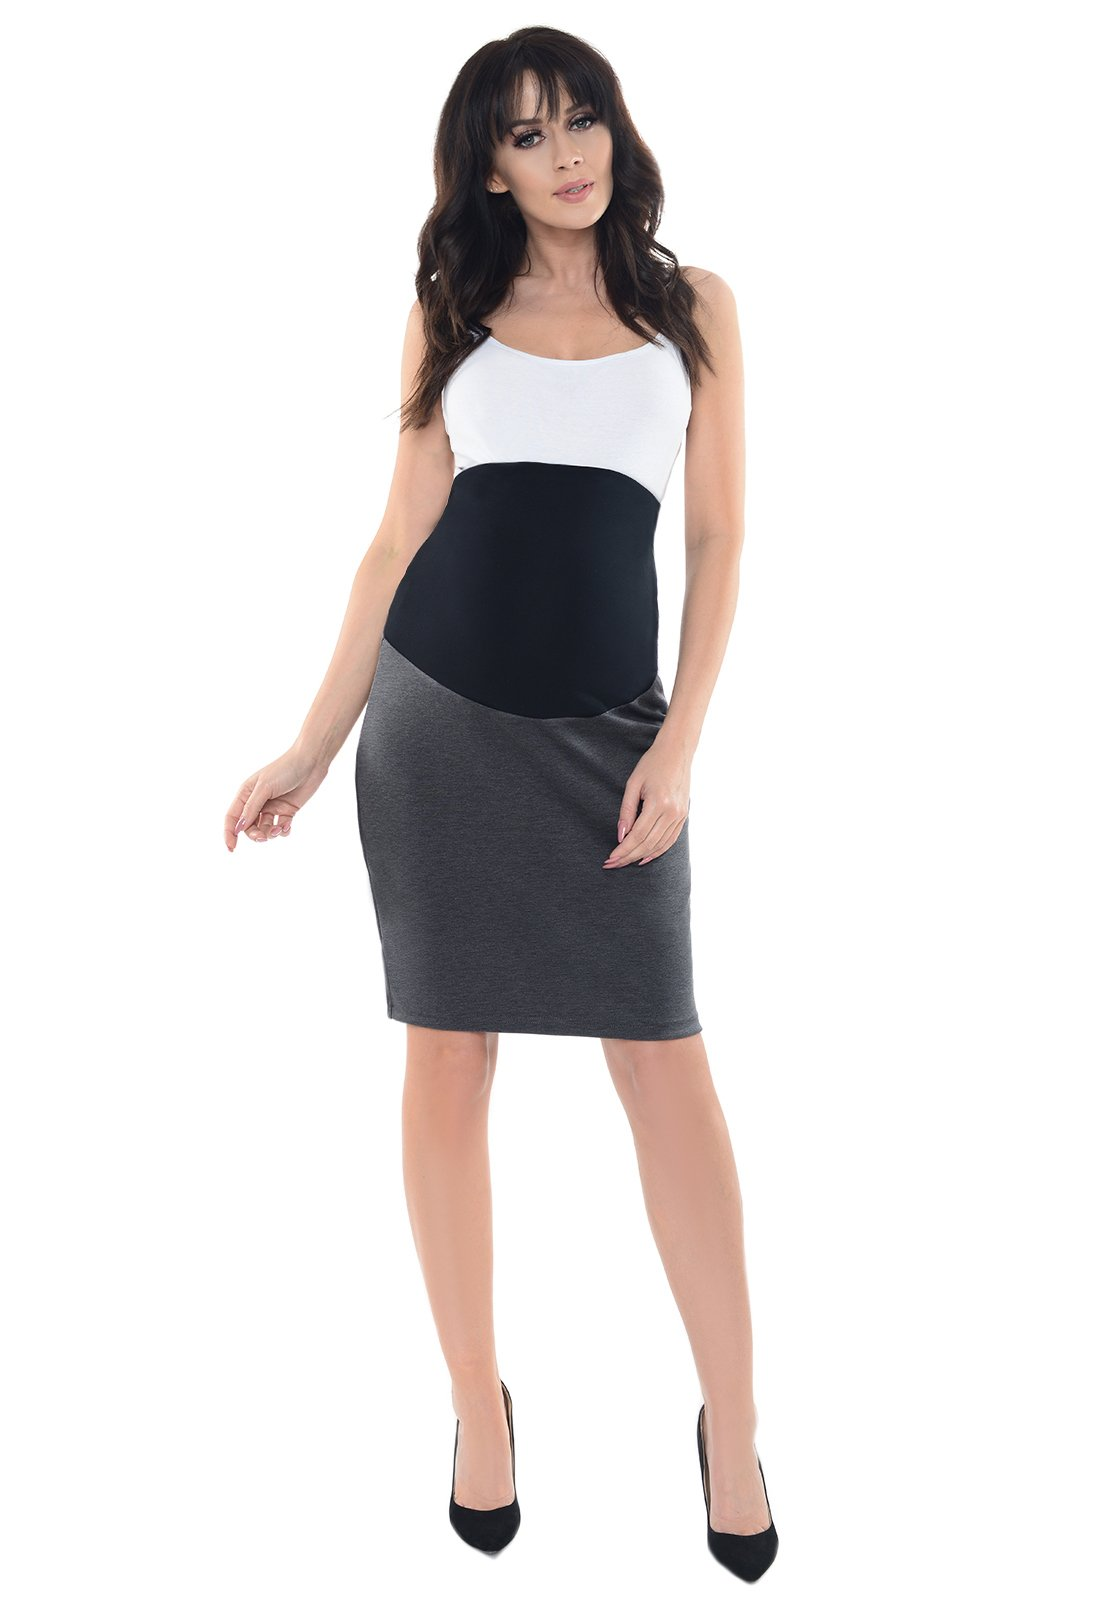 Purpless Maternity Pregnancy Formal Pencil Skirt 1504 (10, Dark Gray)